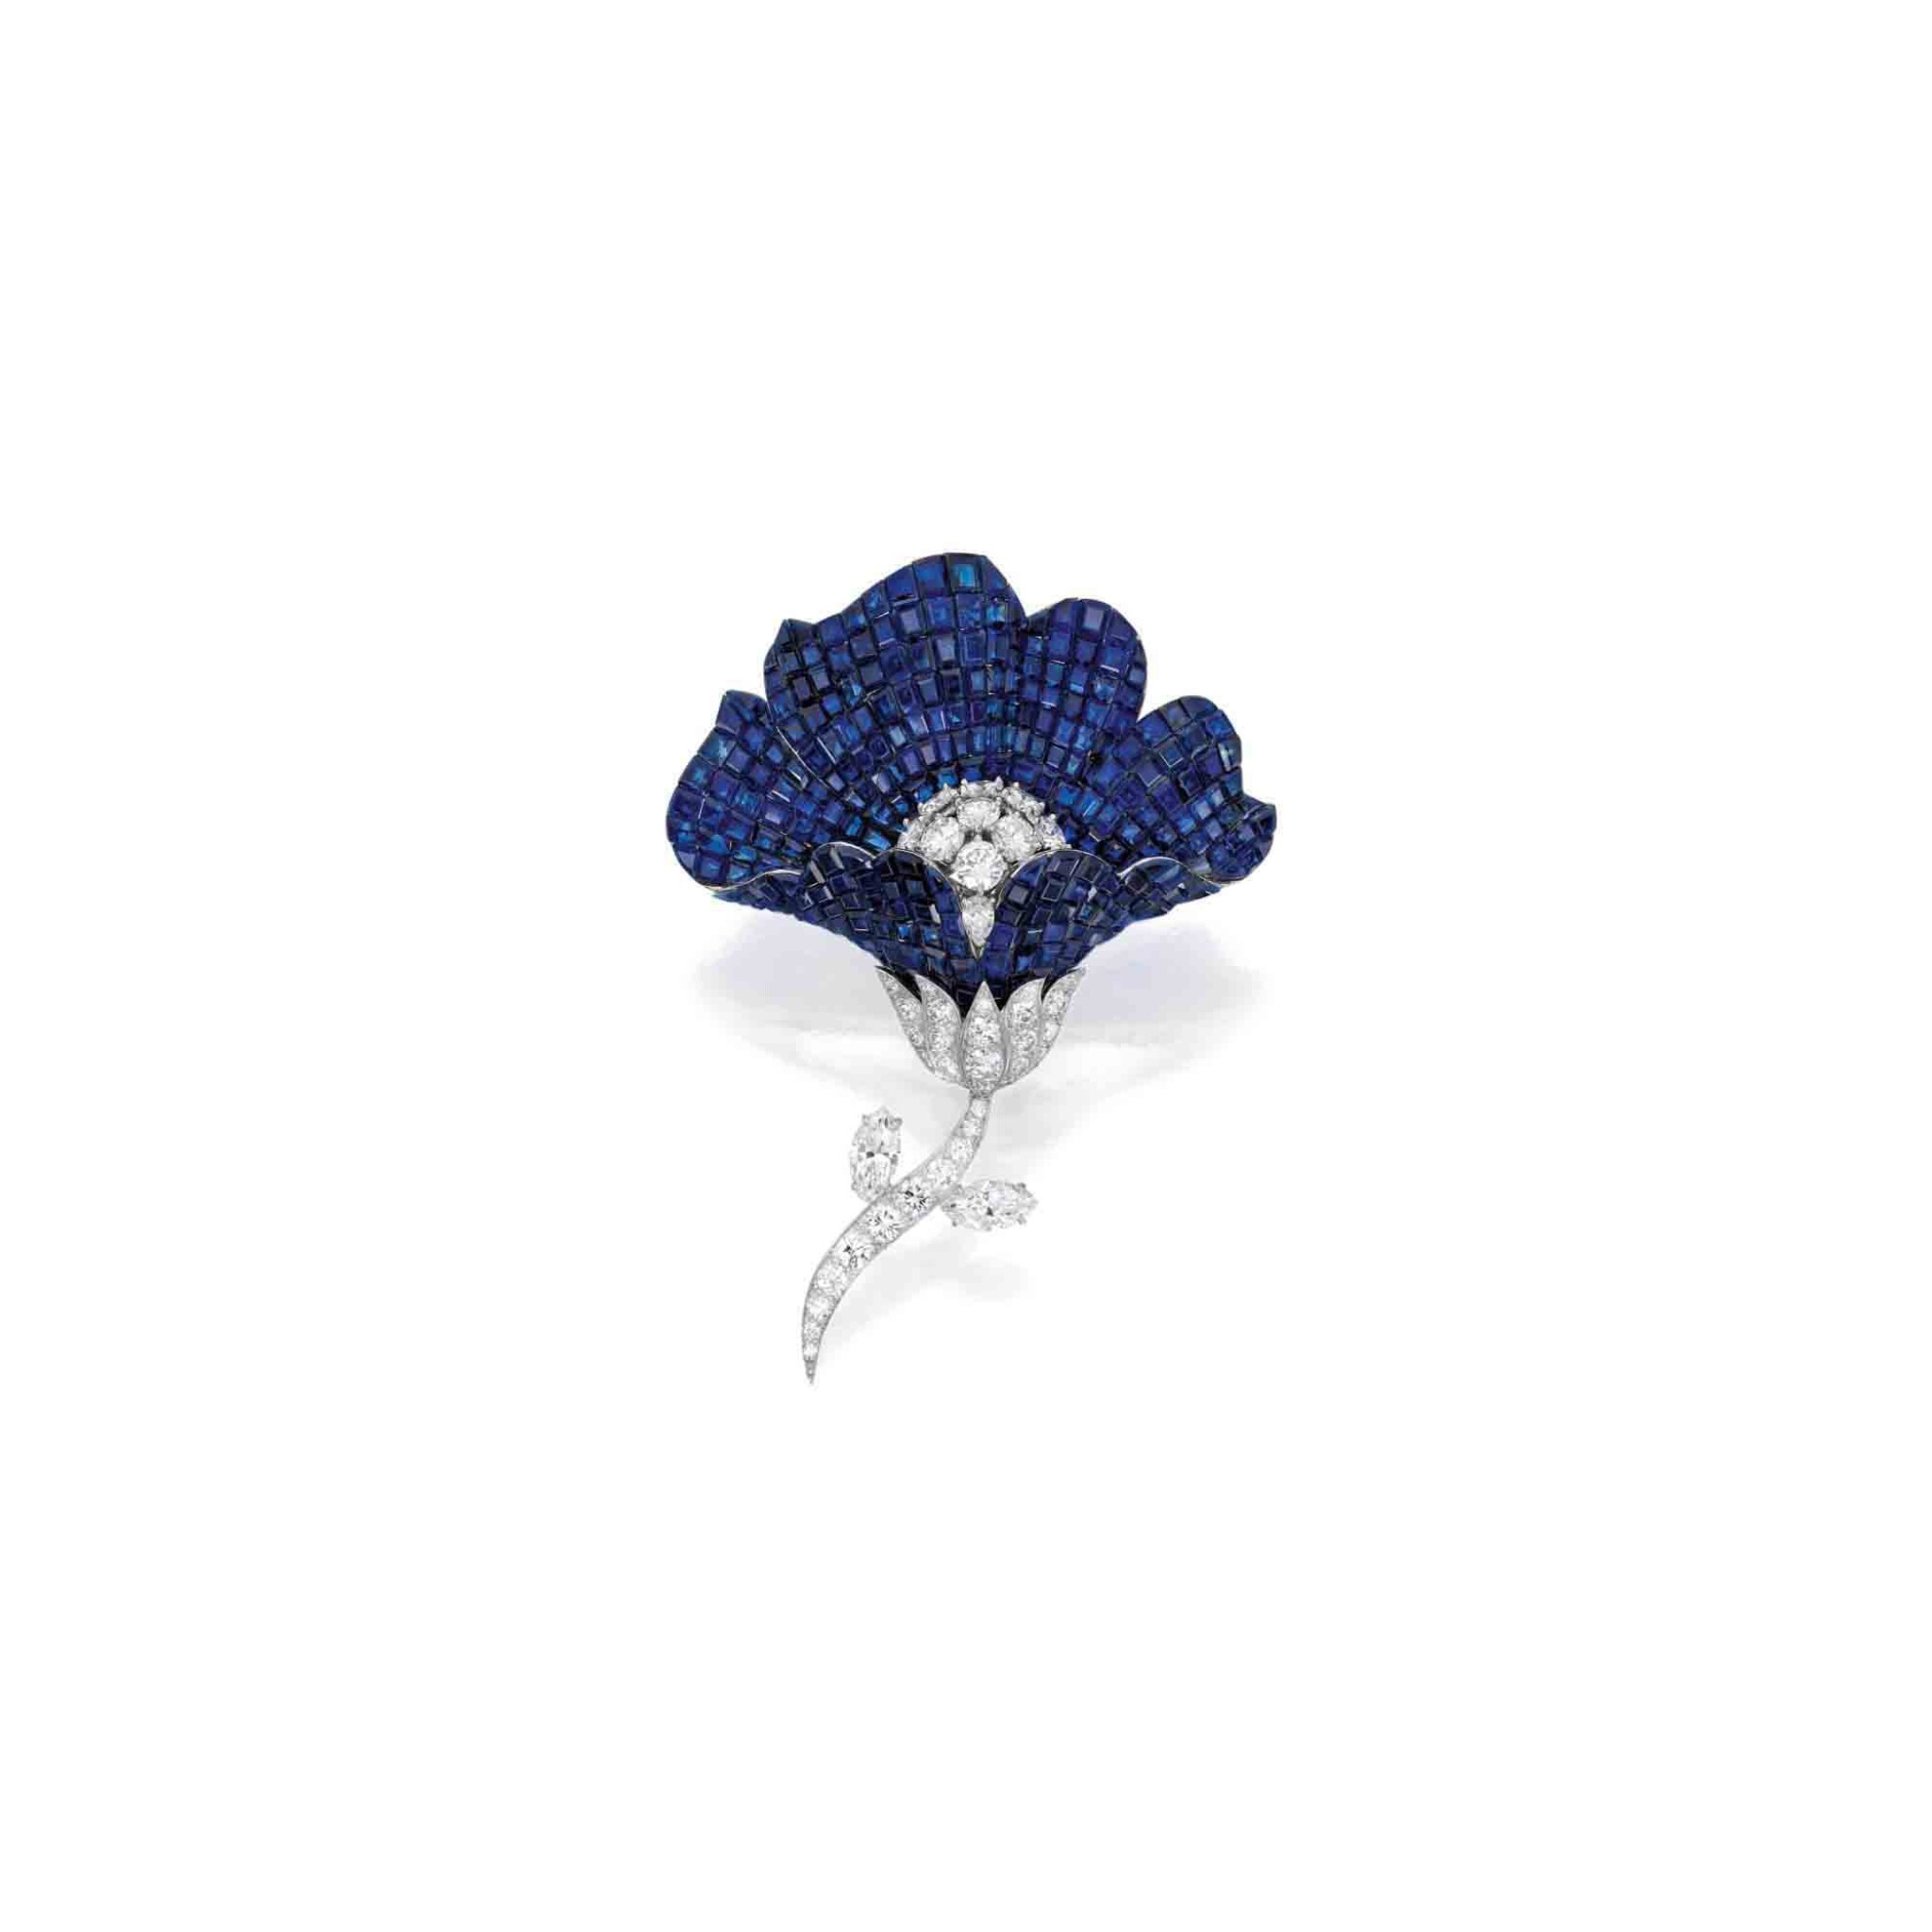 View 1 of Lot 62. Van Cleef & Arpels [梵克雅寶] | Mystery-Set Sapphire and Diamond Brooch [藍寶石配鑽石別針].